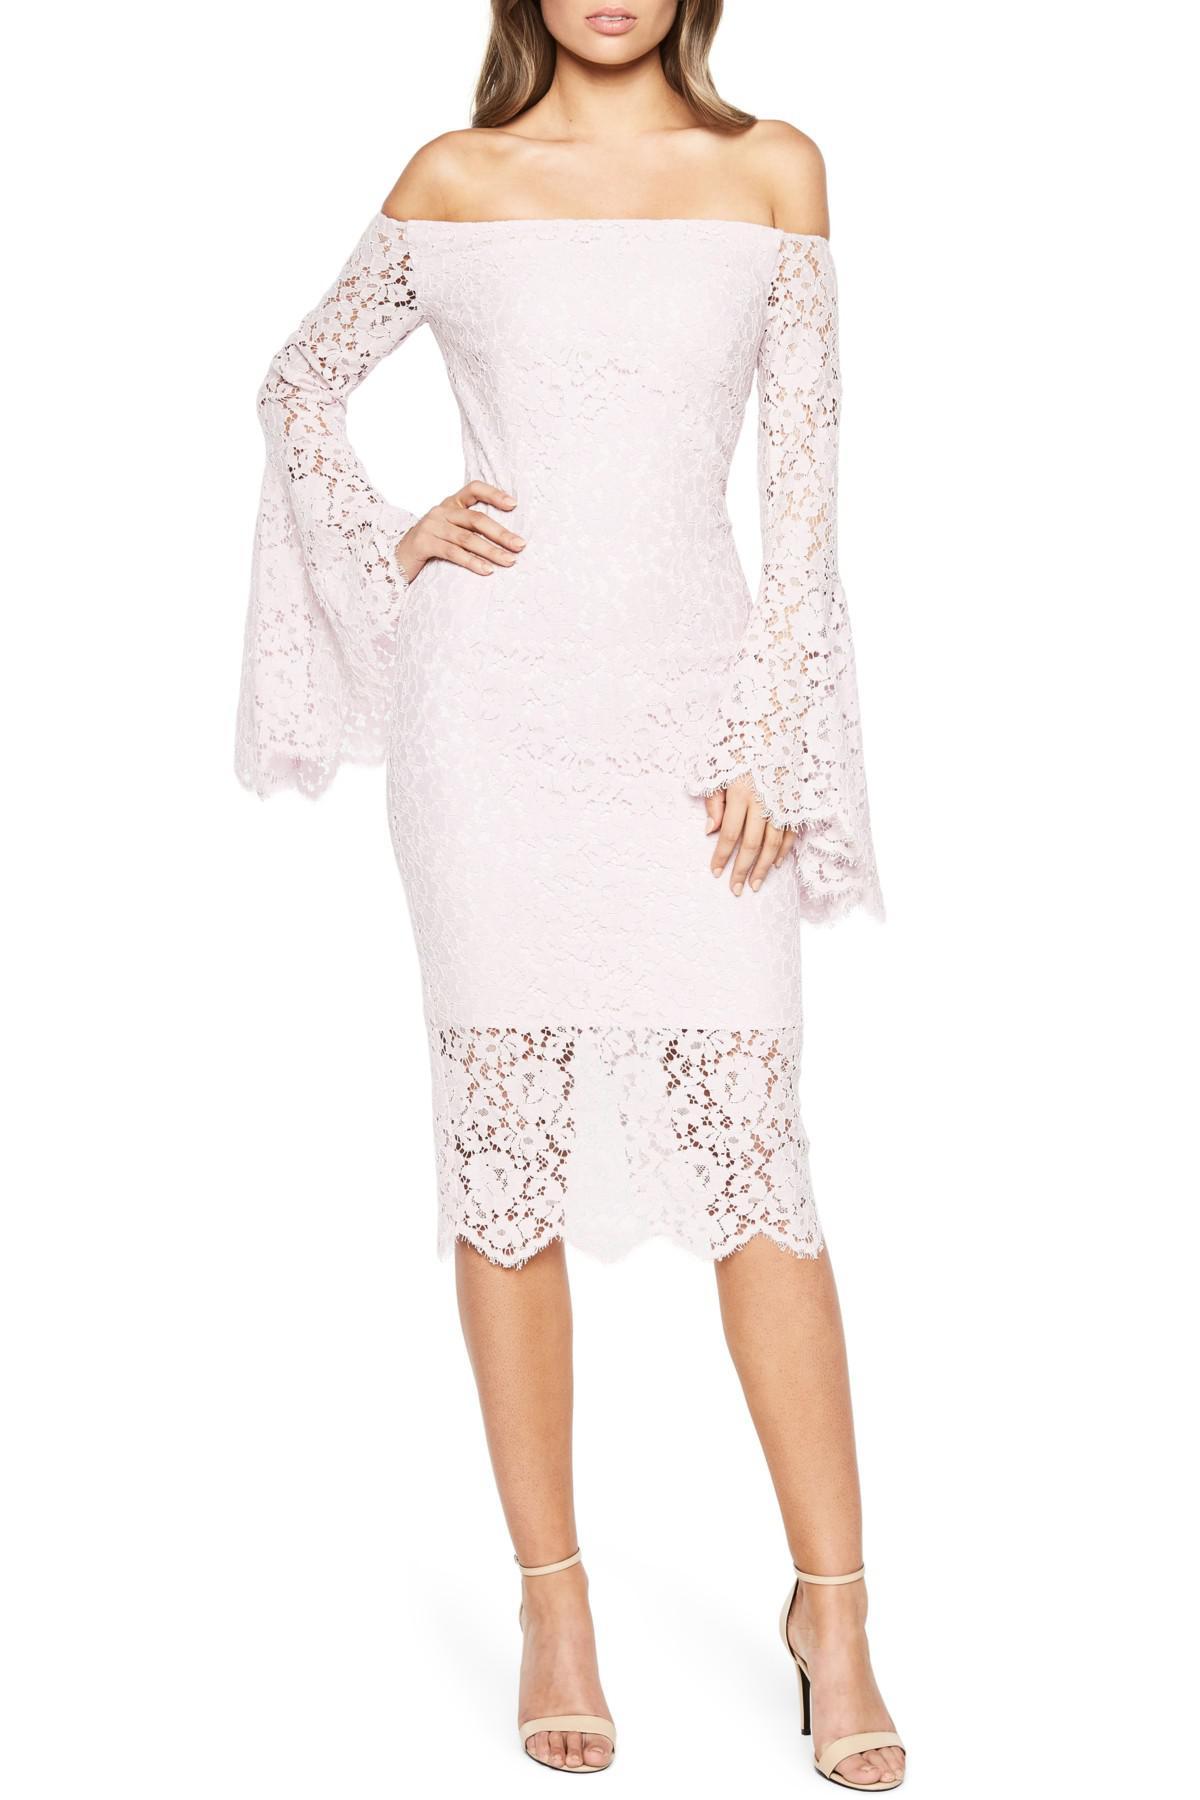 c1f15cd3 Bardot Solange Corded Lace Sheath Dress - Lyst